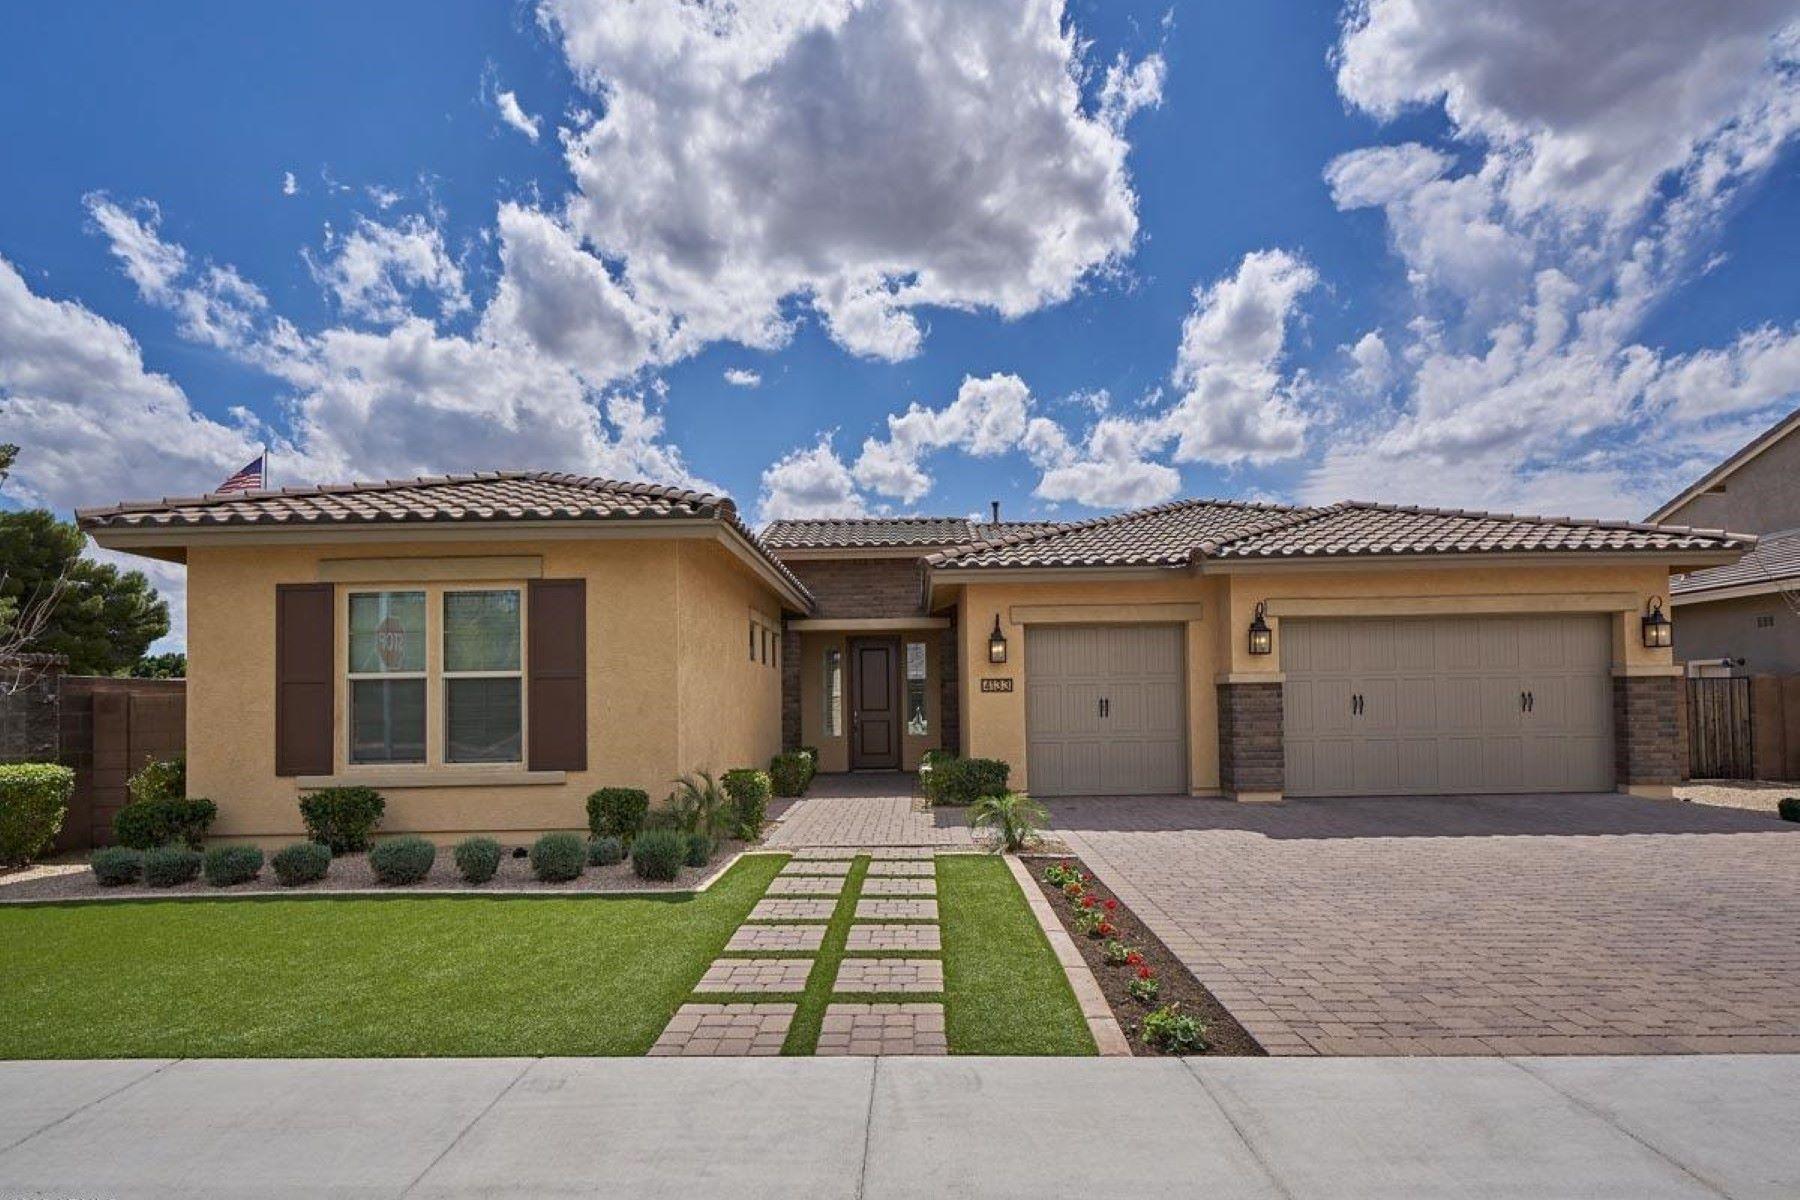 Single Family Homes για την Πώληση στο Leawood 4133 E GABLE AVE, Mesa, Αριζονα 85206 Ηνωμένες Πολιτείες